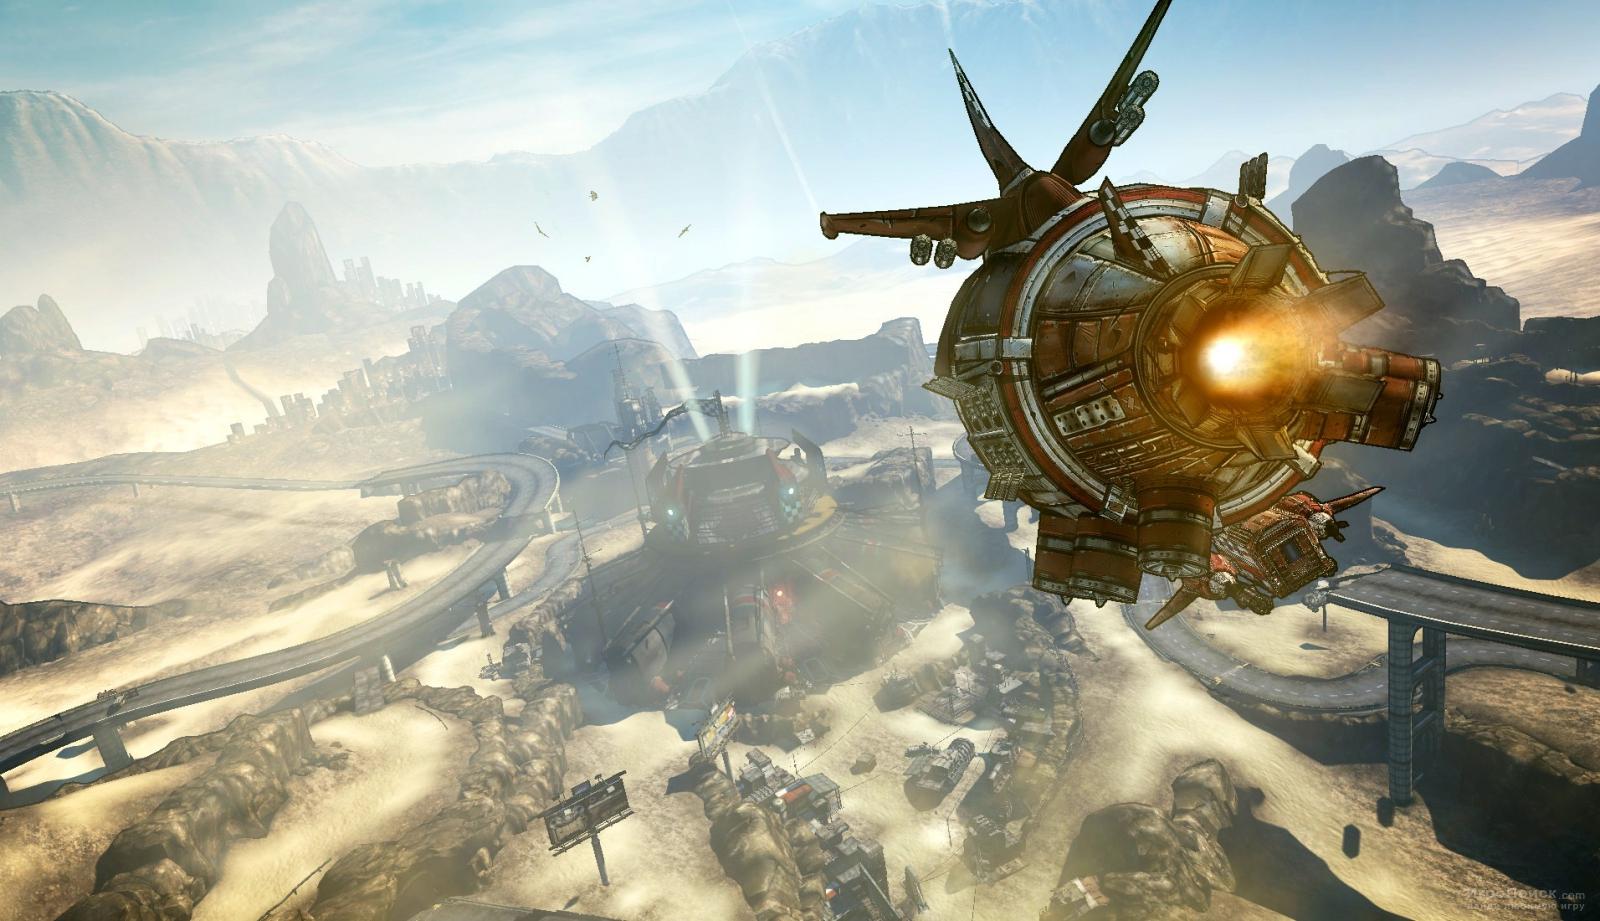 Скриншот к игре Borderlands 2: Mr. Torgue's Campaign of Carnage